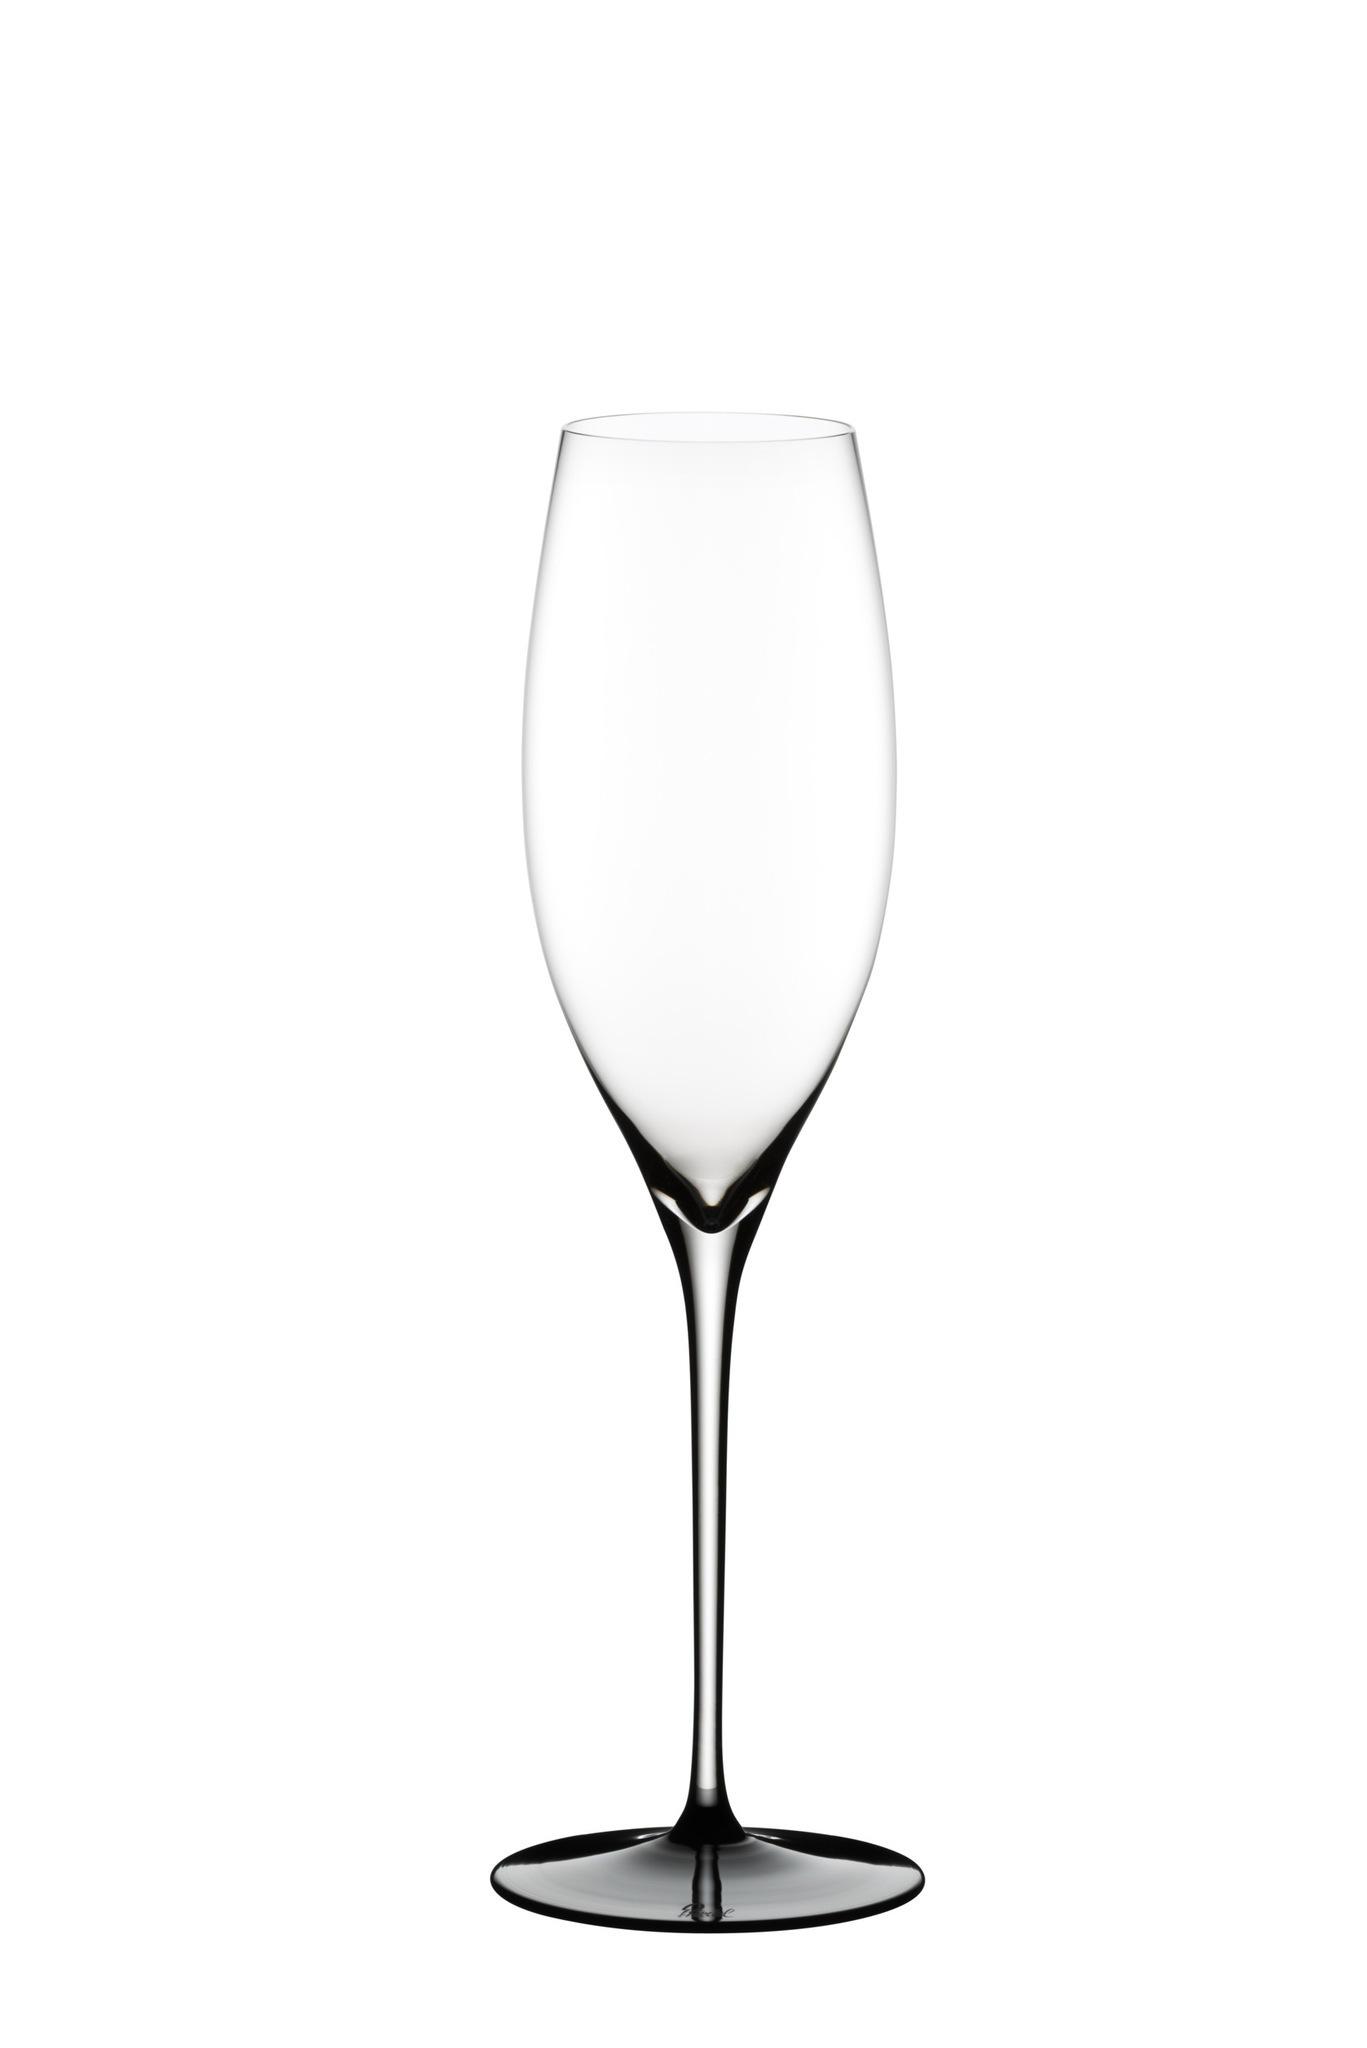 Бокал для шампанского Riedel Sommeliers Black Tie Vintage Champagne Glass, 330 мл